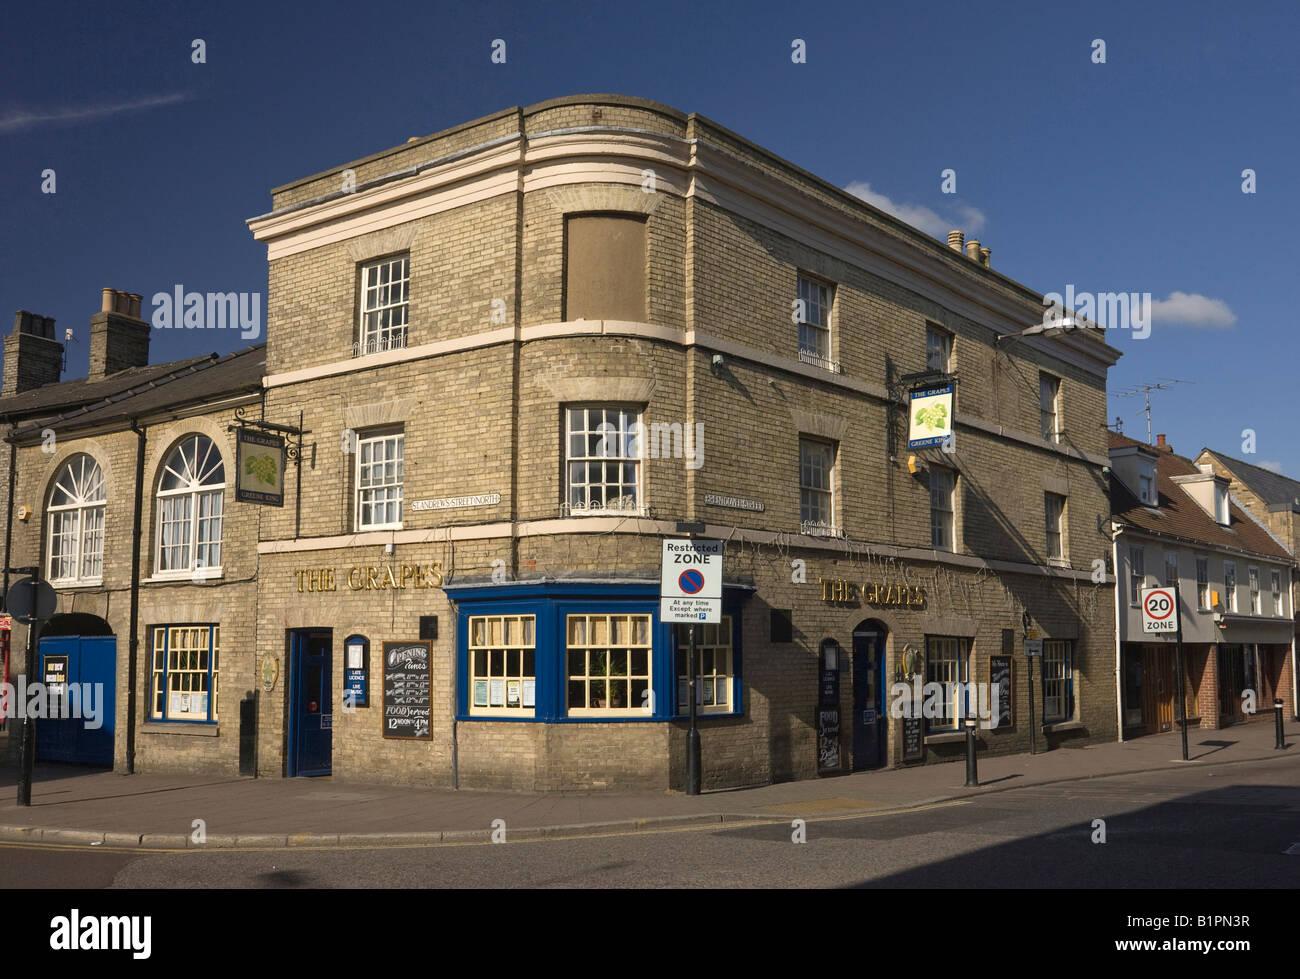 The Grapes Pub in Bury St Edmunds, UK - Stock Image